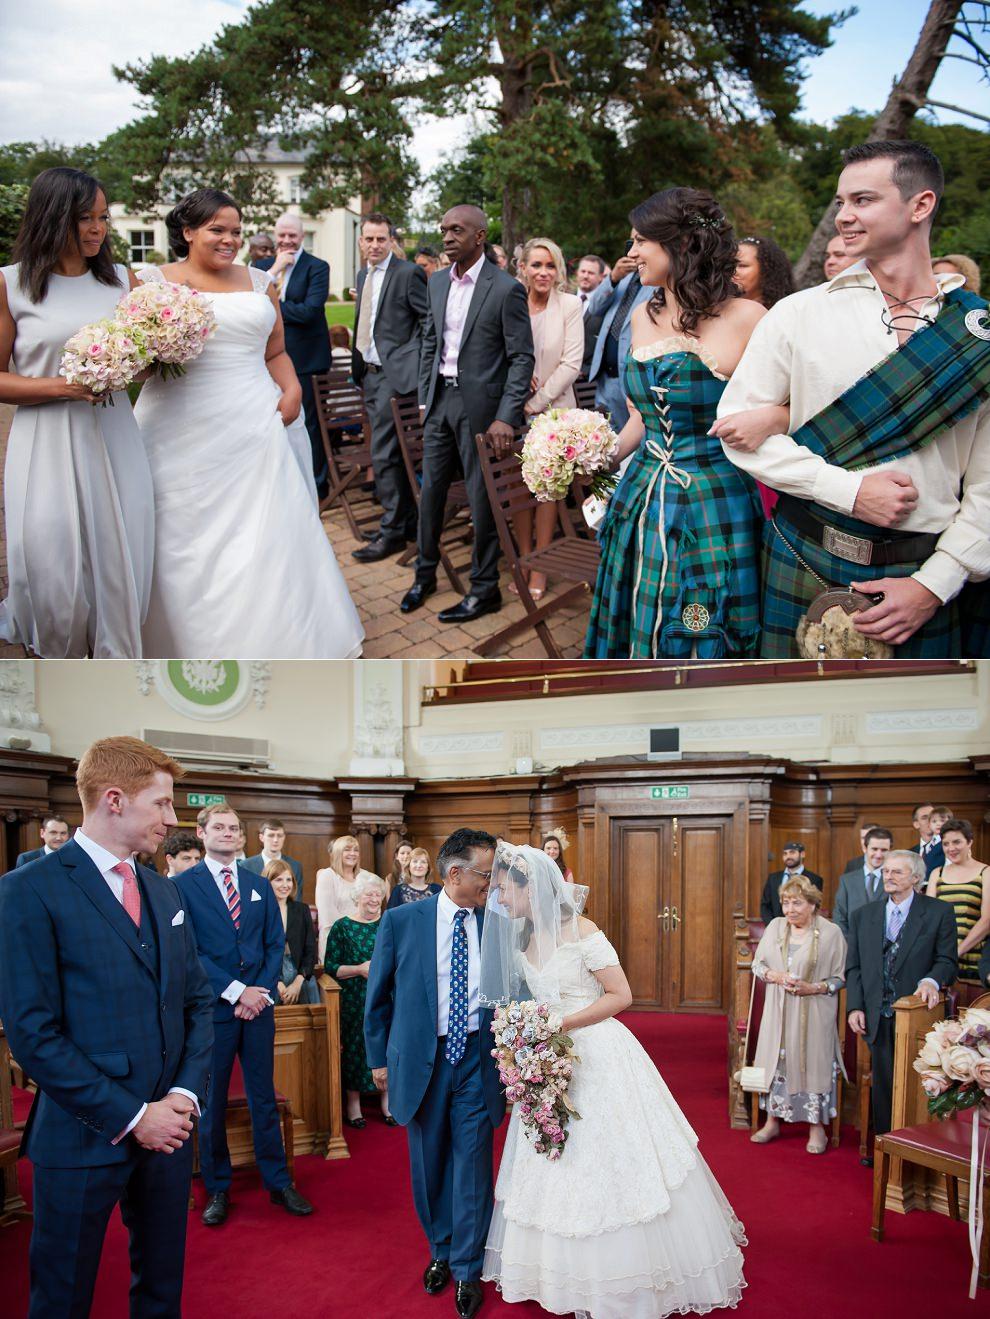 Best-wedding-photos-UK-2015-055